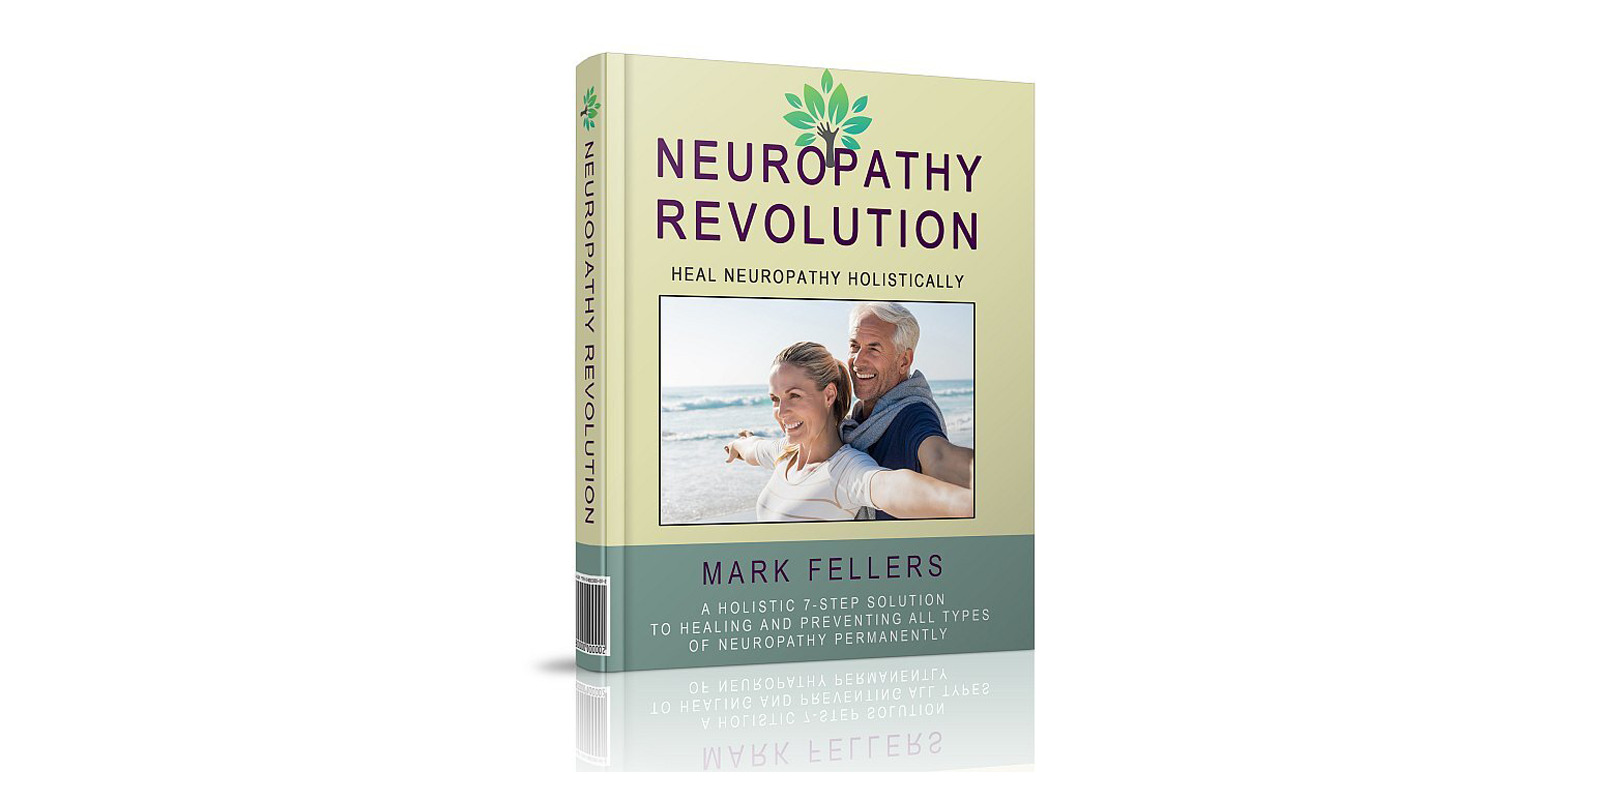 Neuropathy Revolution review